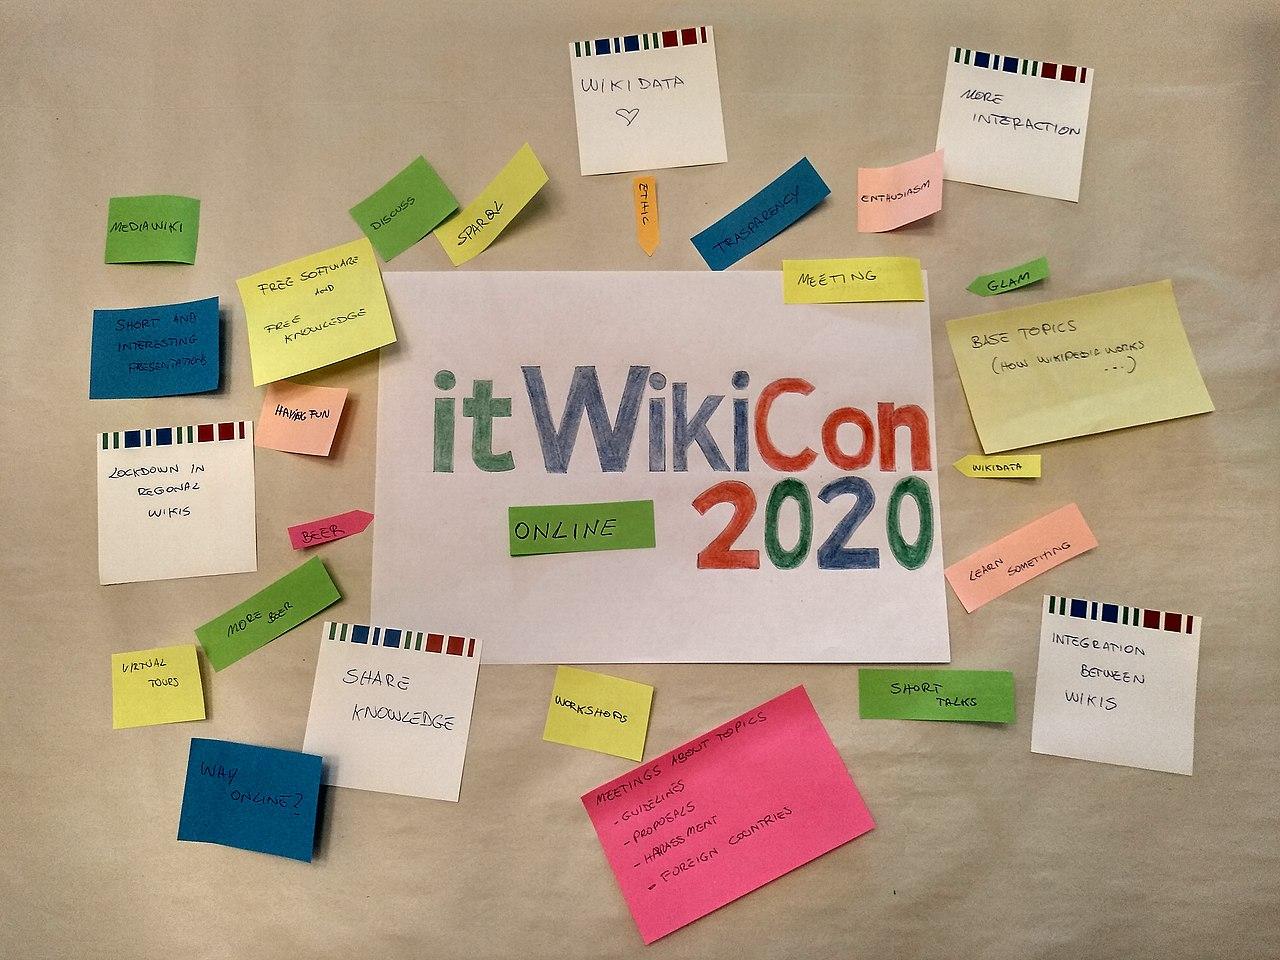 itWikiCon community survey post-it